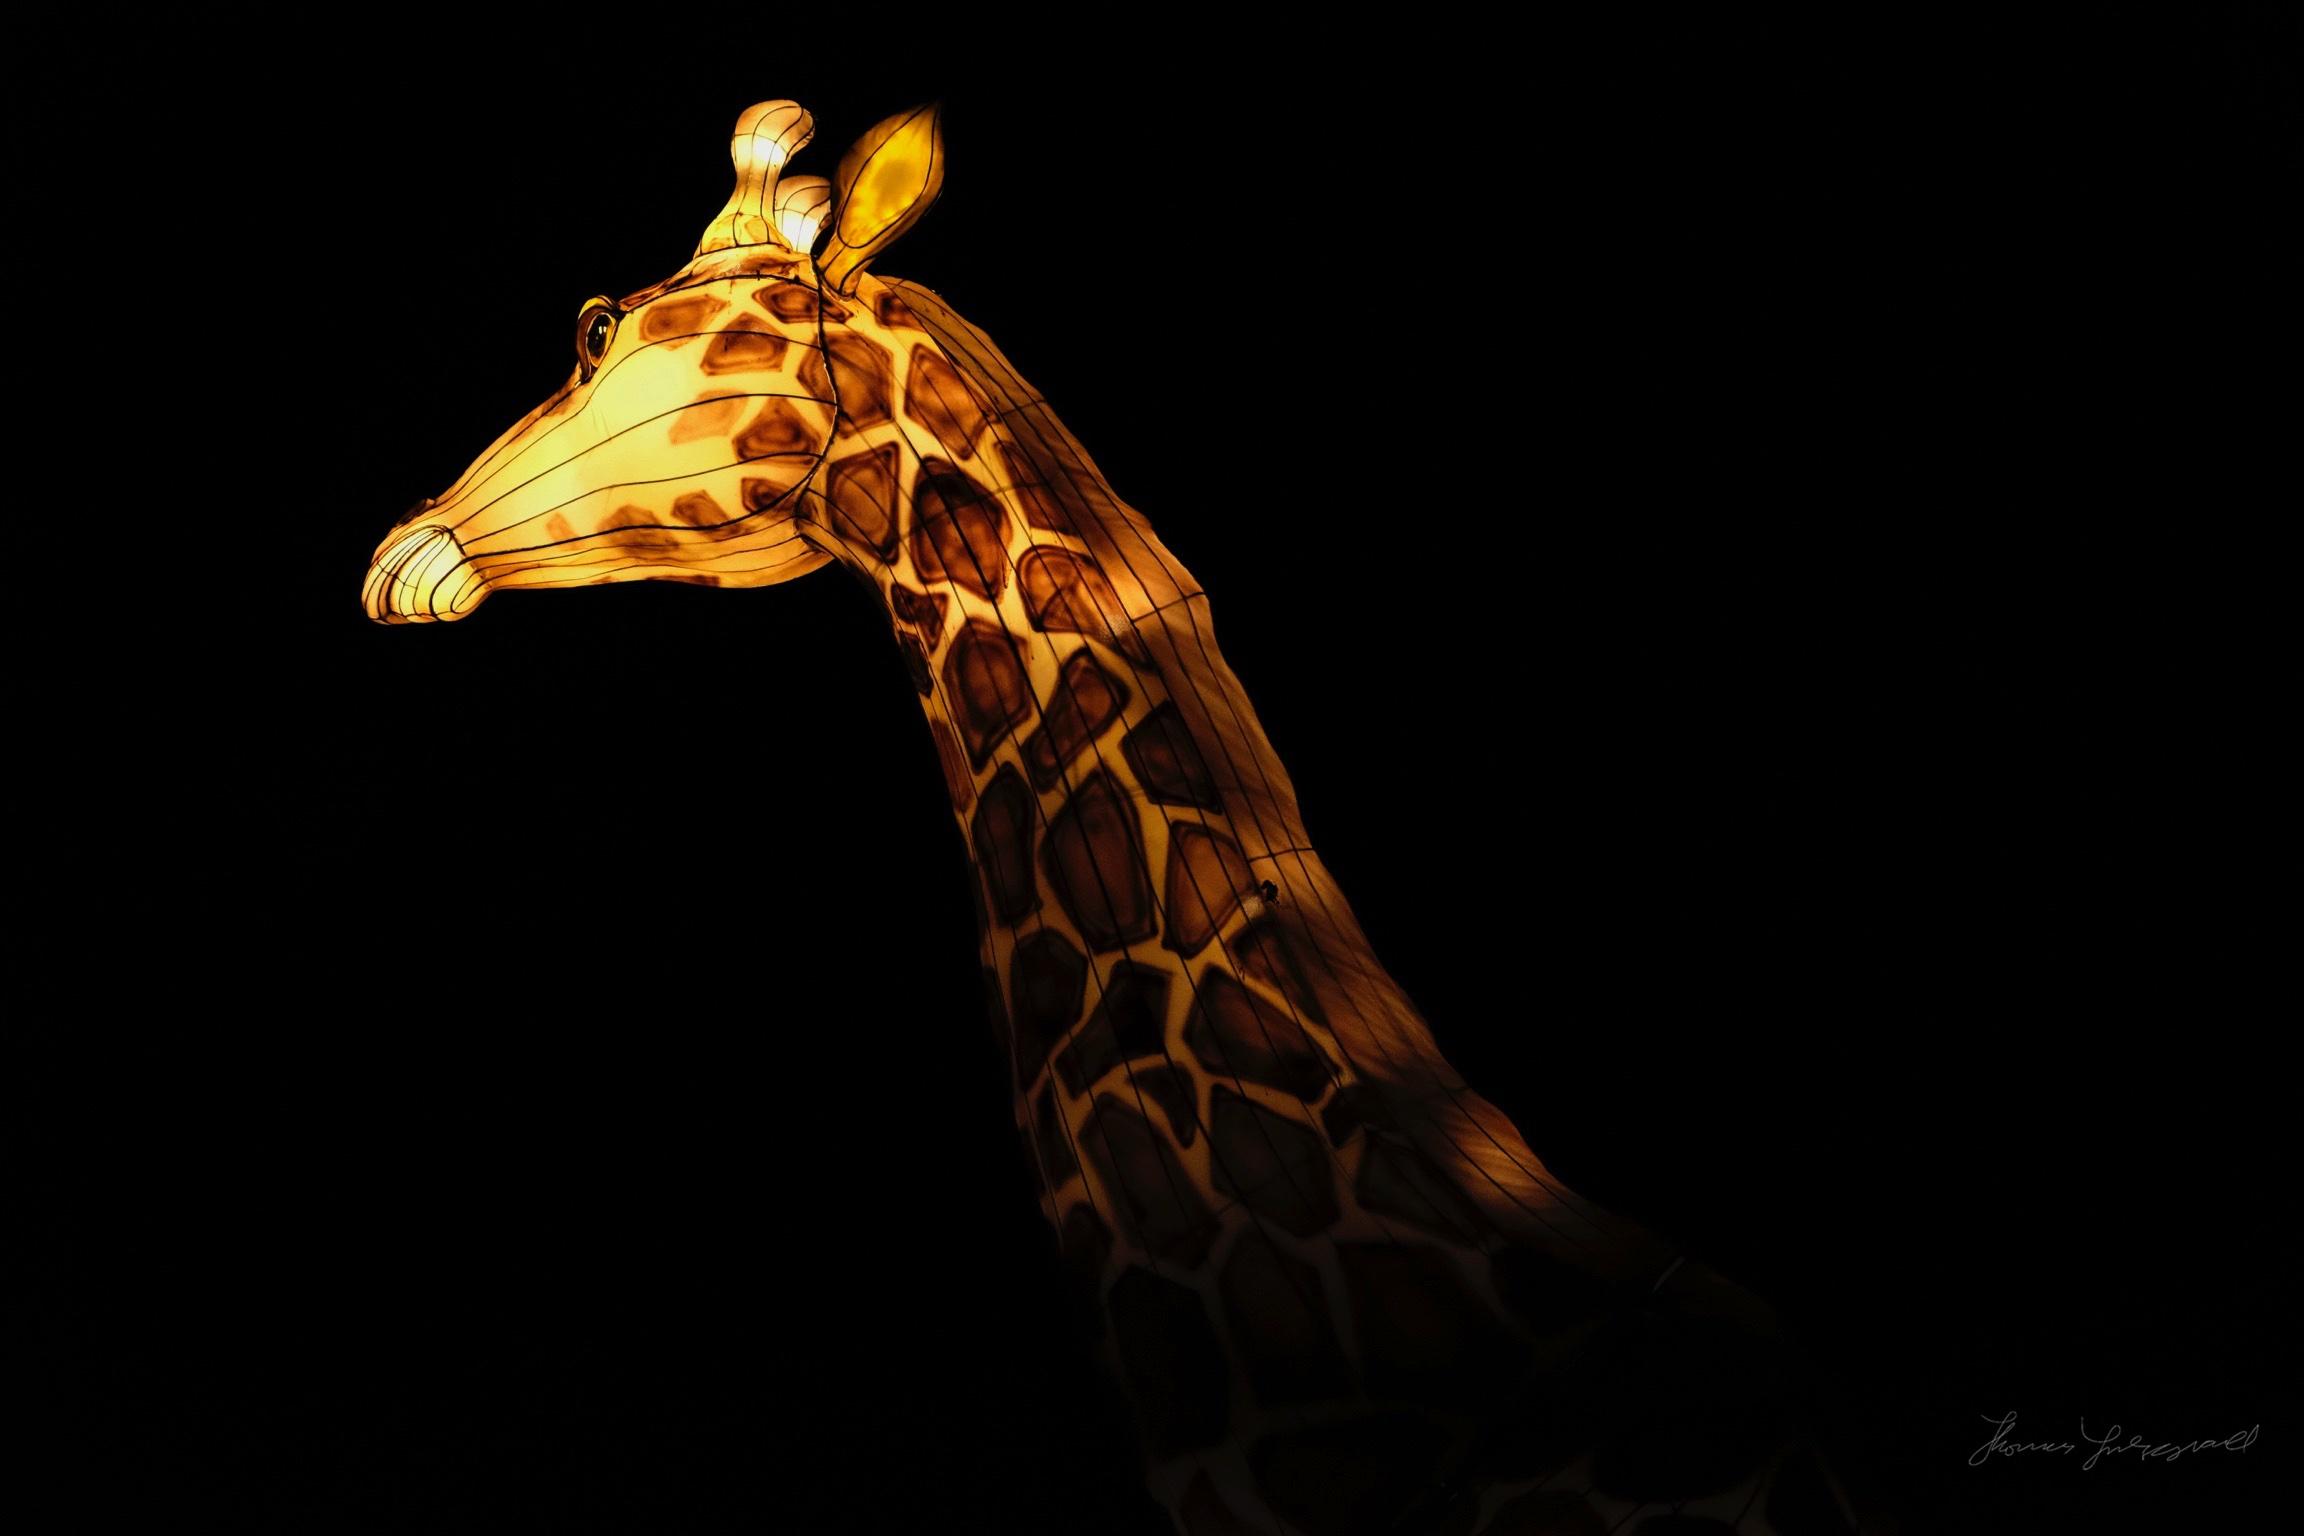 Wild-Lights-Dublin-Zoo-096.jpg